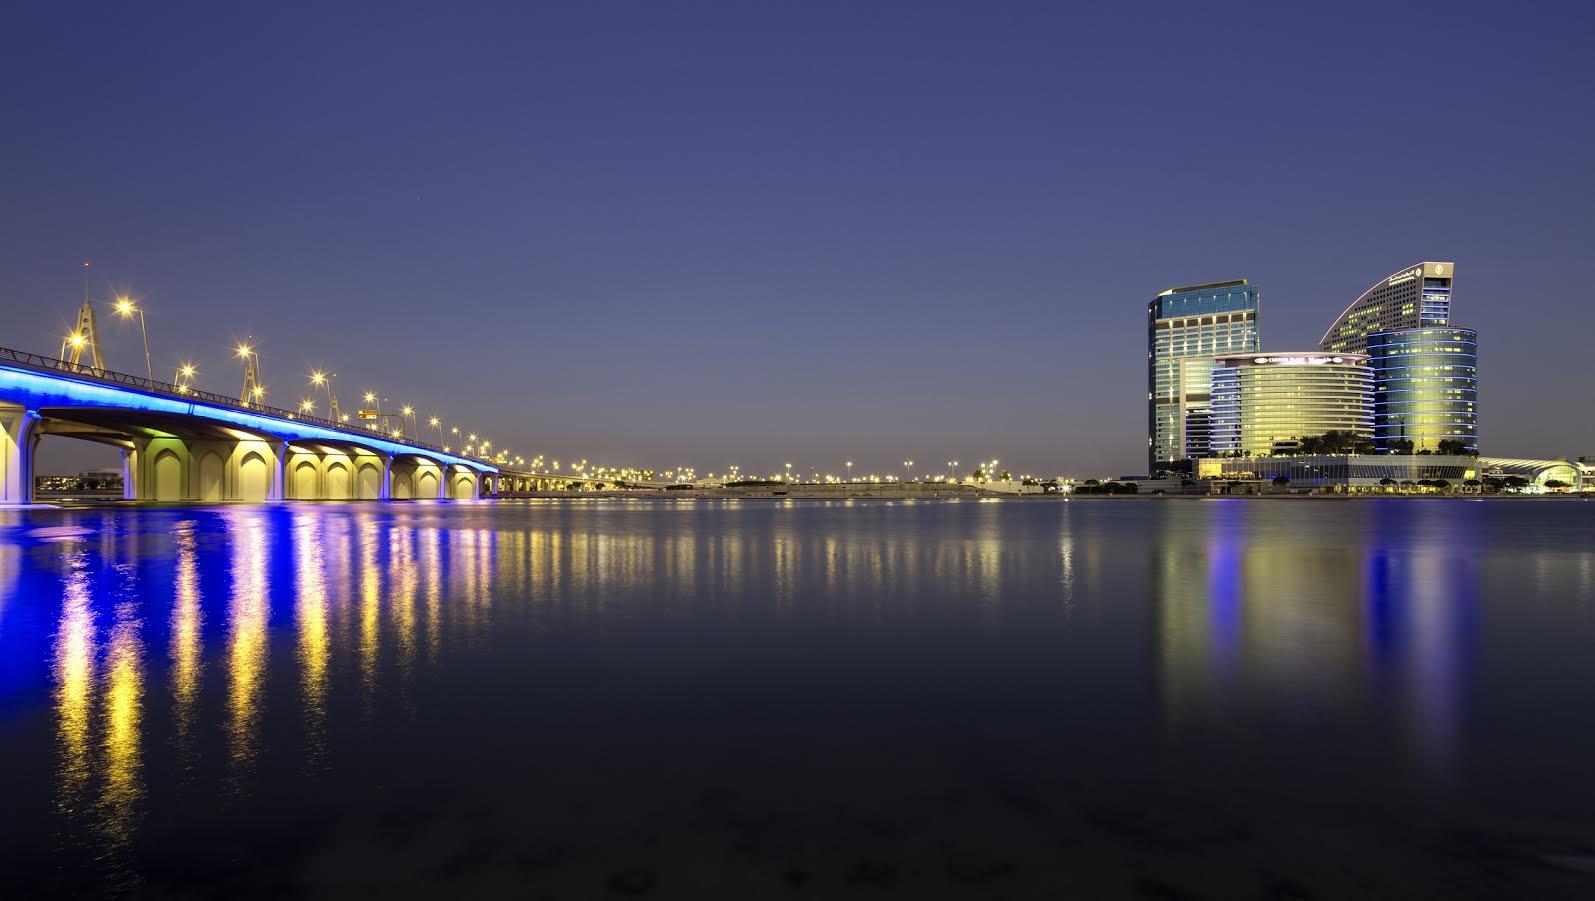 Photo of مطاعم فندق إنتركونتينينتال دبي فيستيفال تحتفل بعيد الفصح